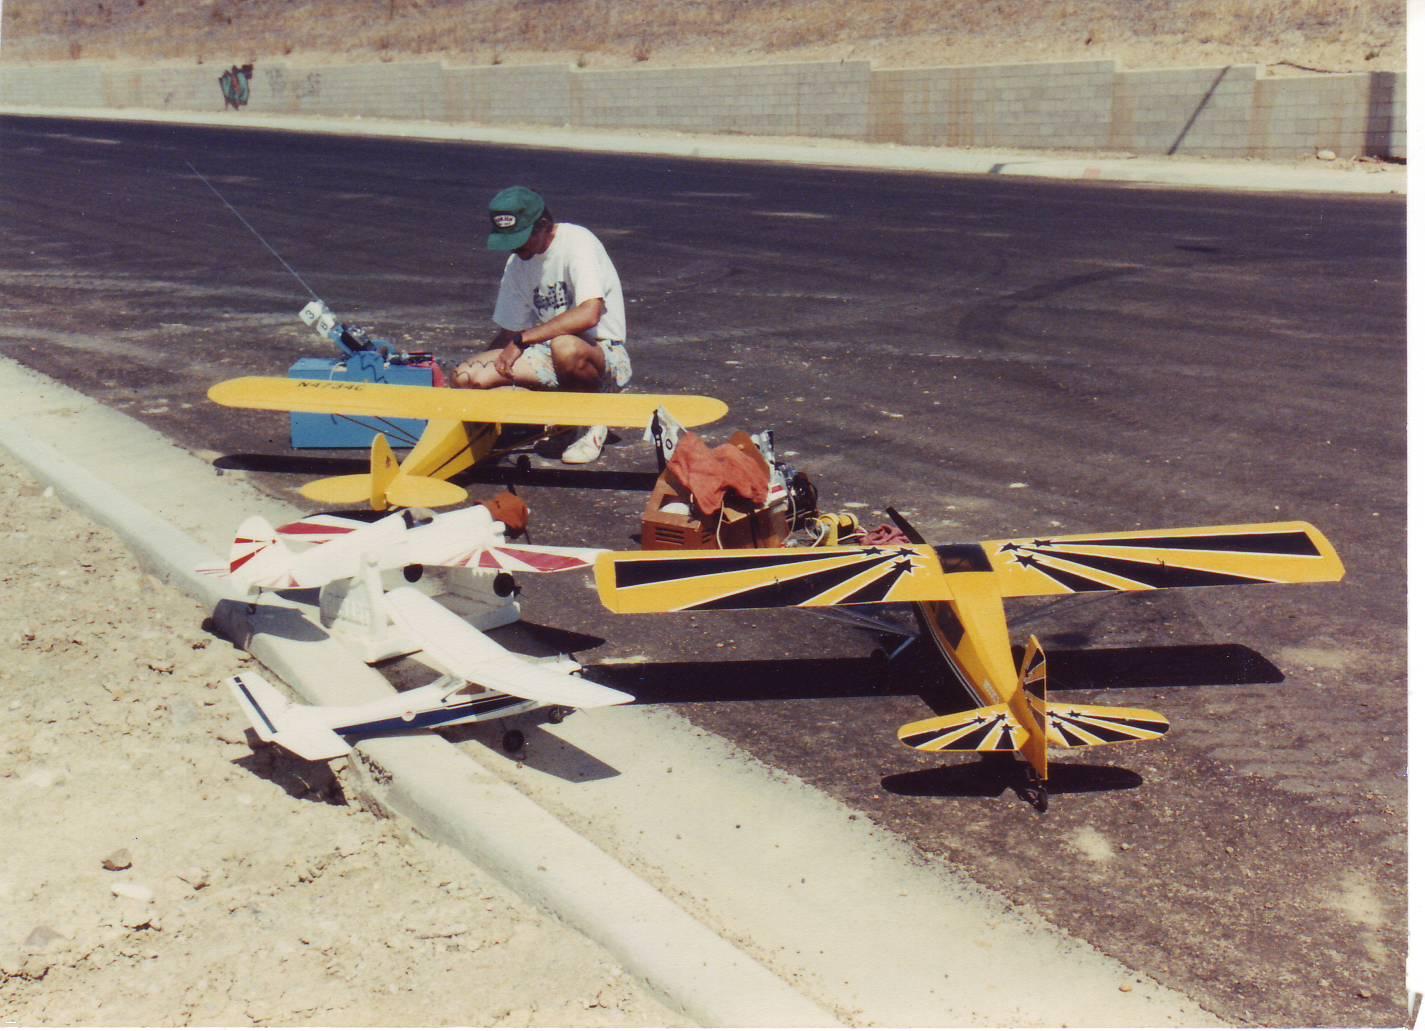 Pilot kits - RCU Forums